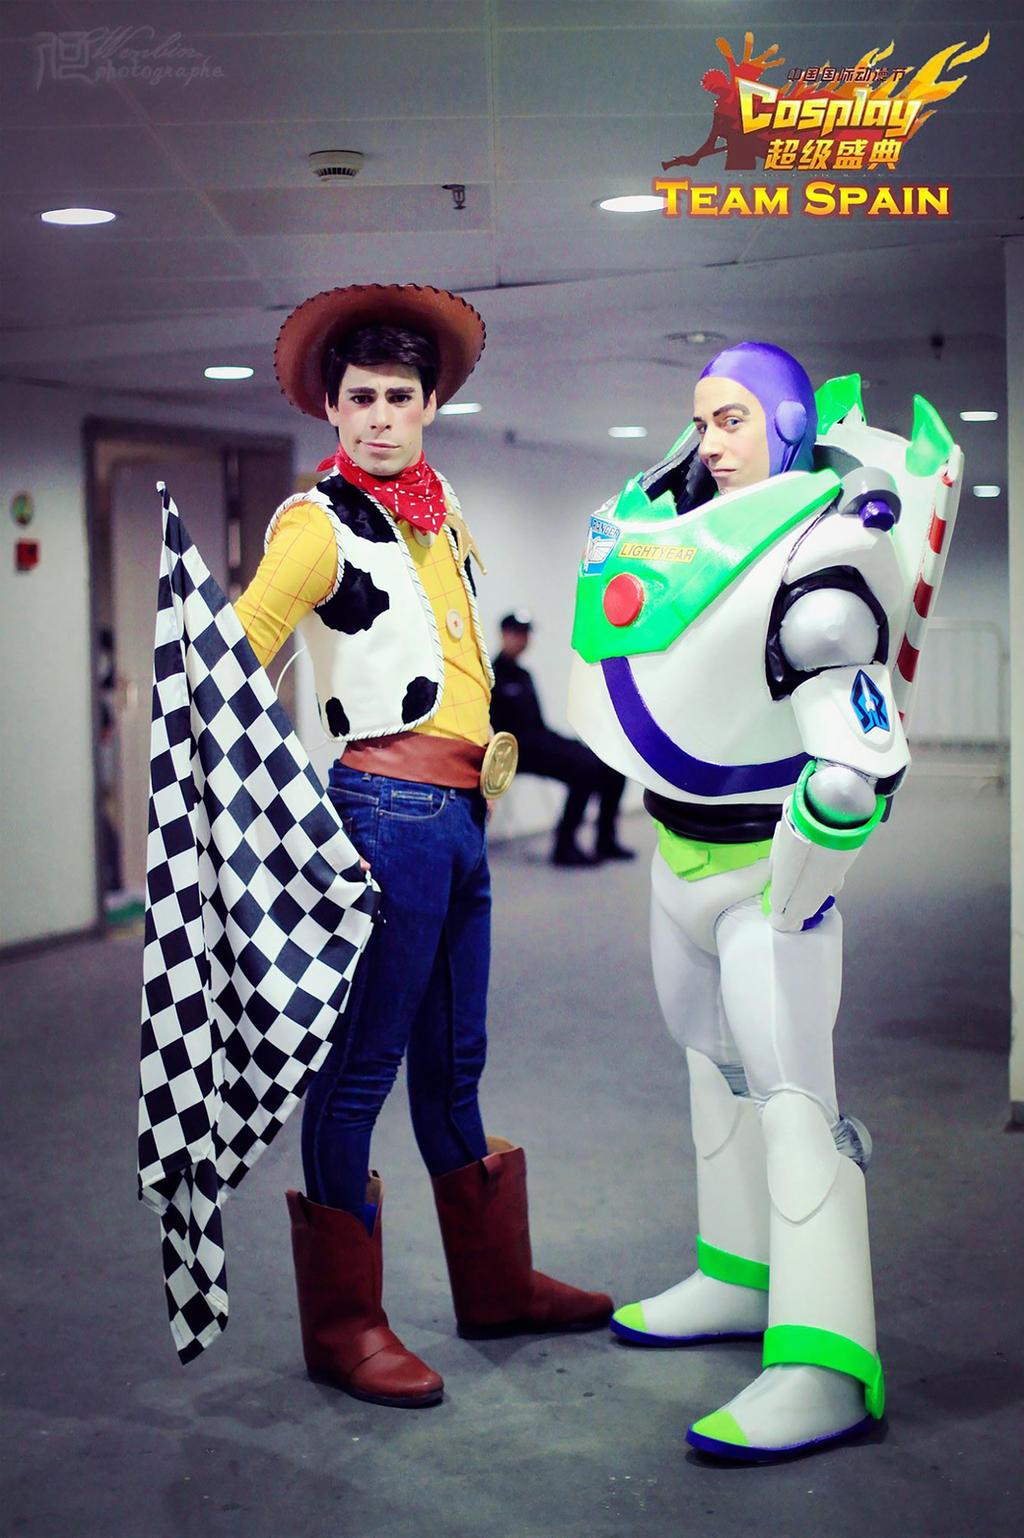 buzz lightyear and woody cosplay by taifu89 on deviantart